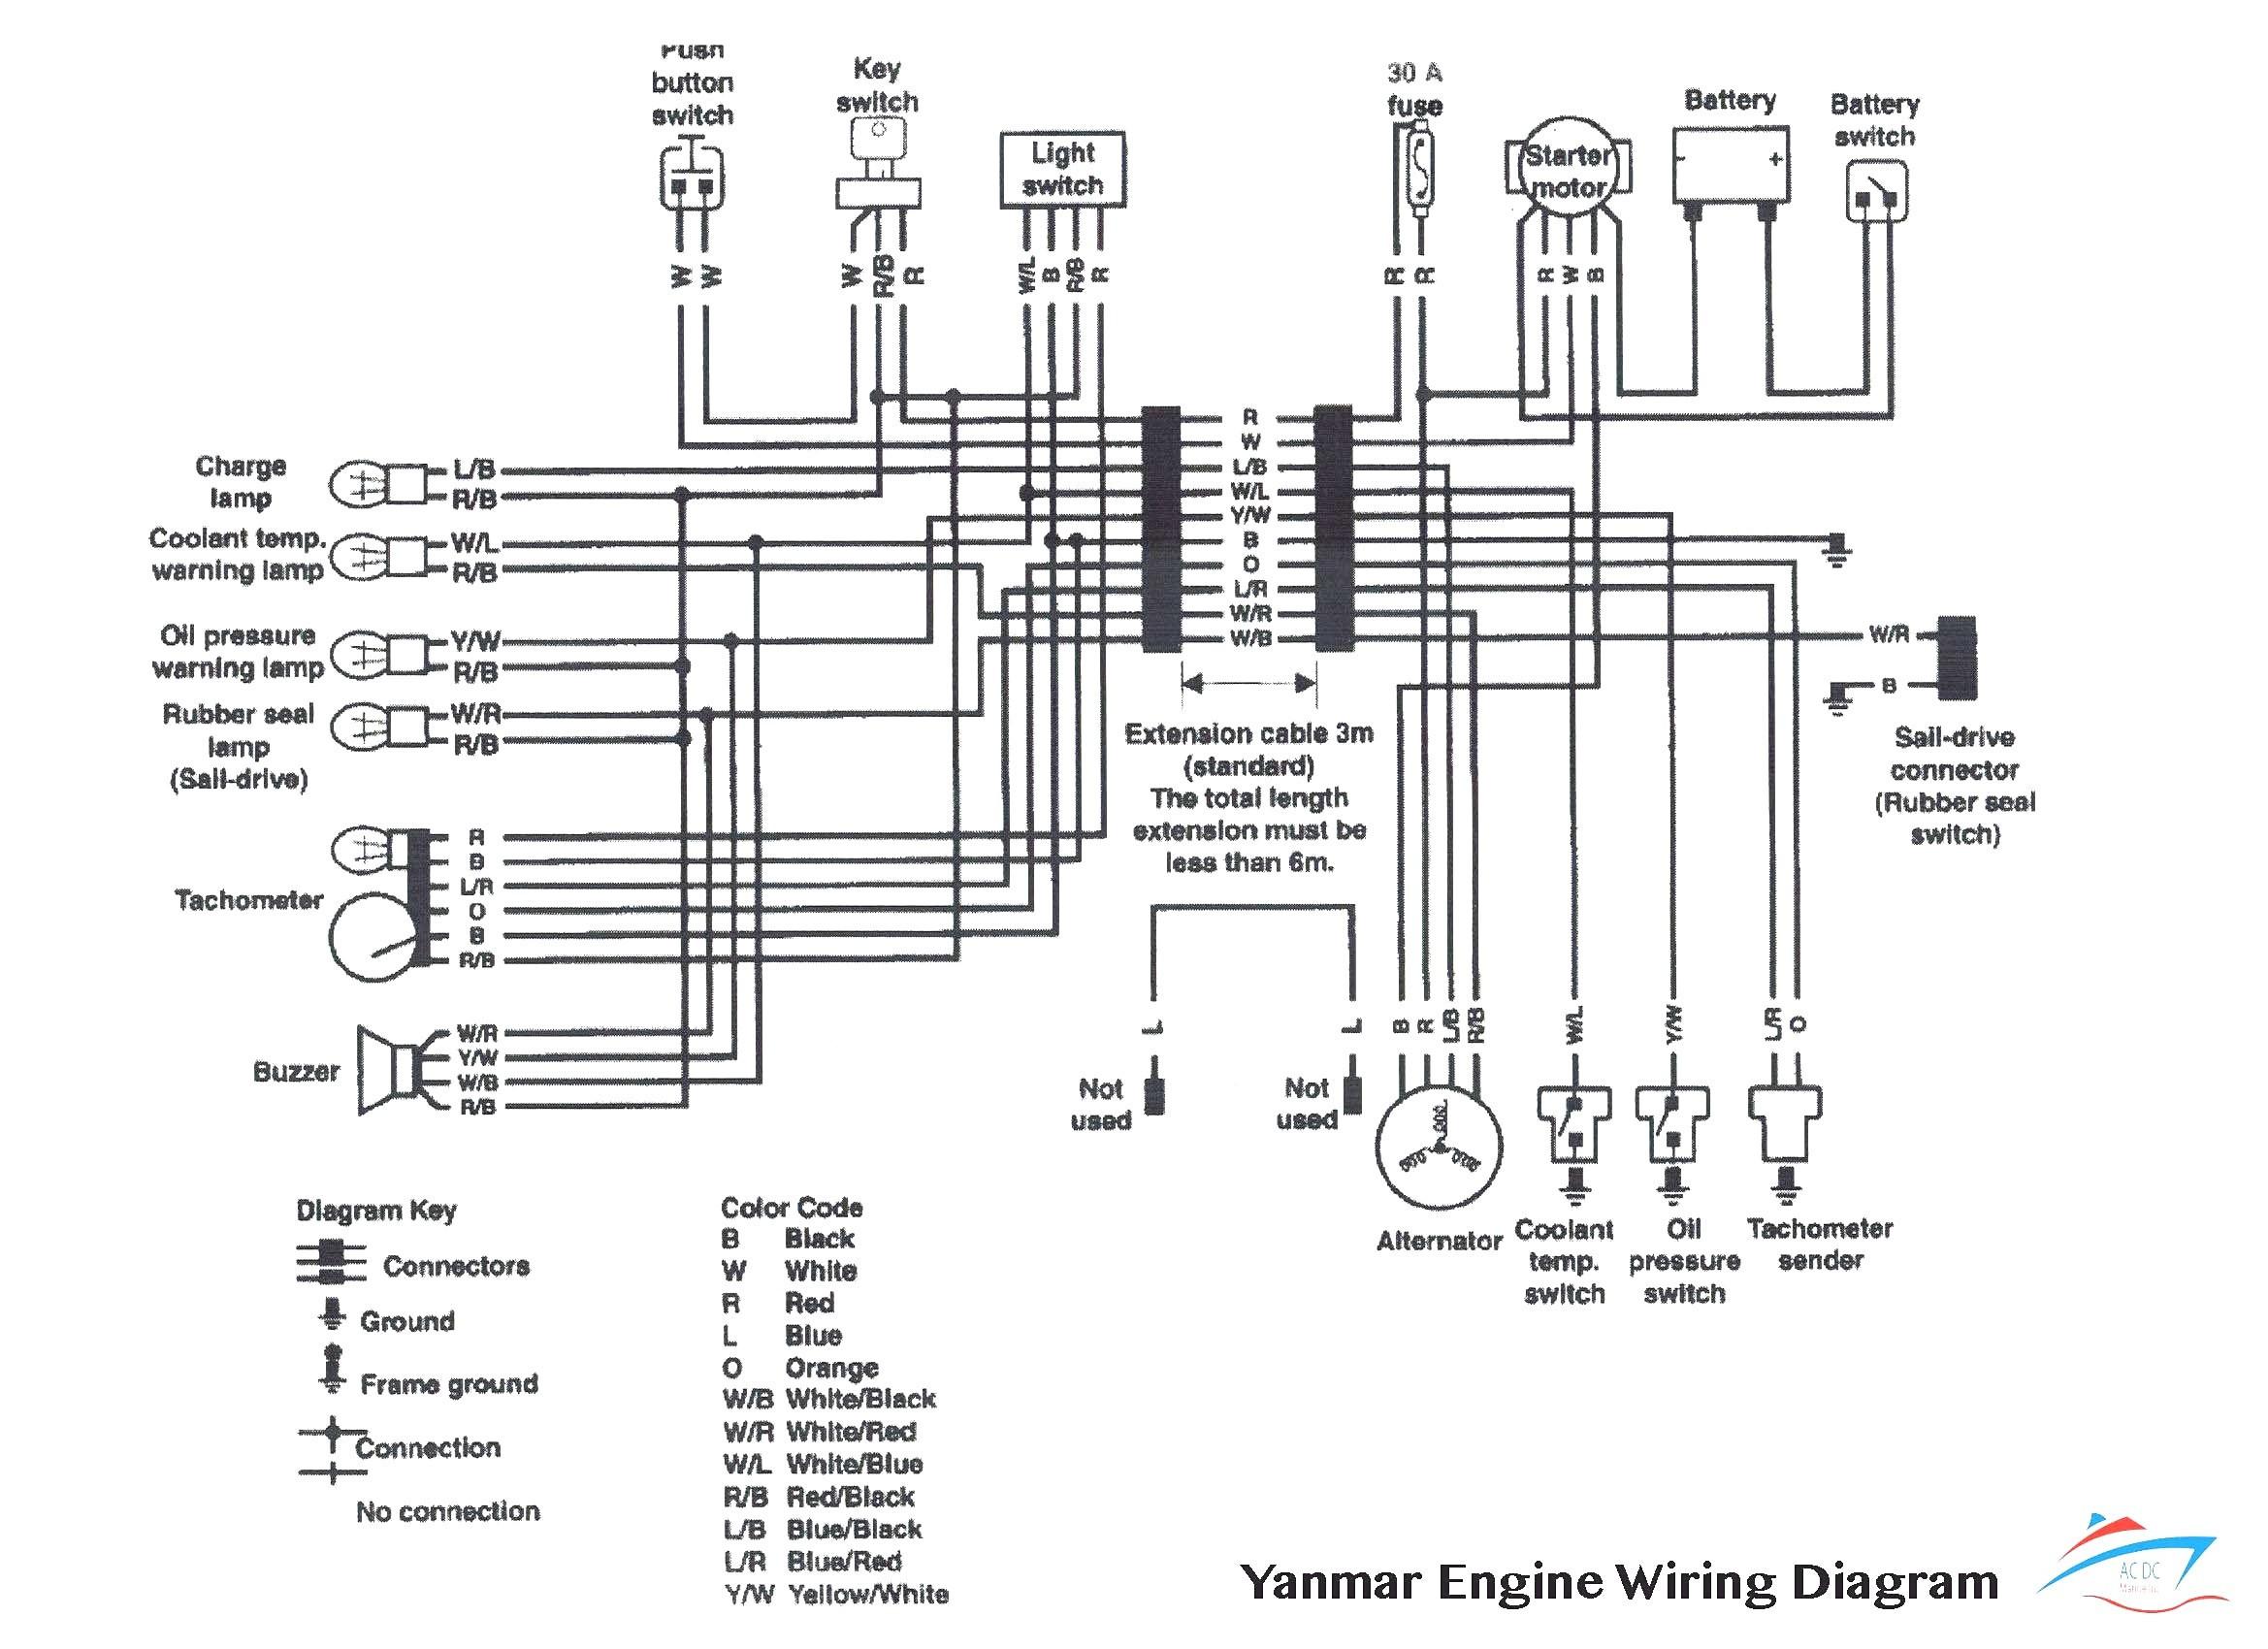 Alternator Wiring Diagram Tachometer Valid Ipphil Page 18 27 Diagram Sample and Wiring Diagrams Free